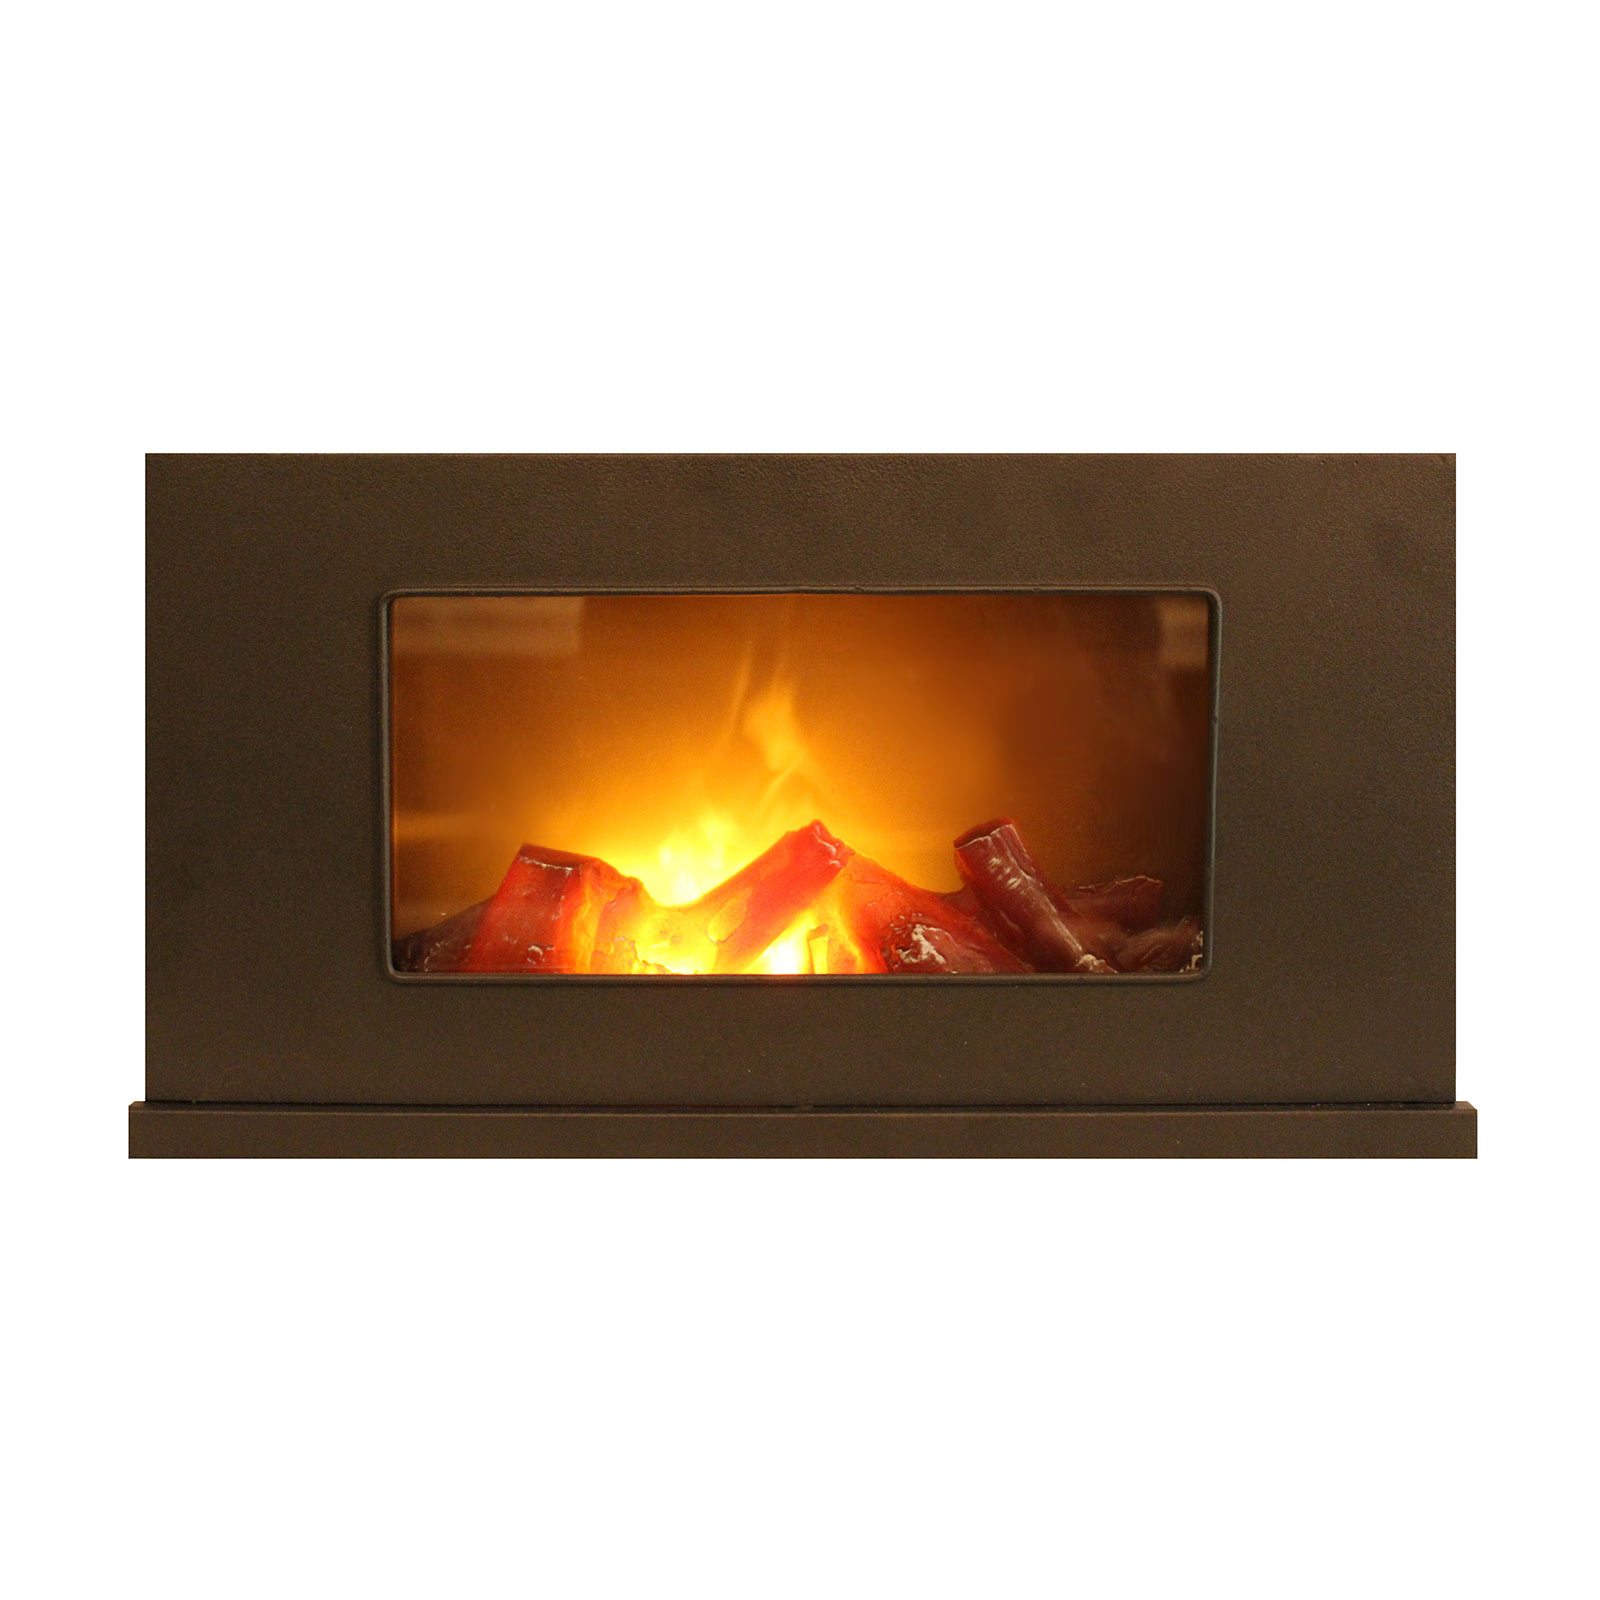 LED-Laterne Fireplace, flackernd, Breite 40 cm